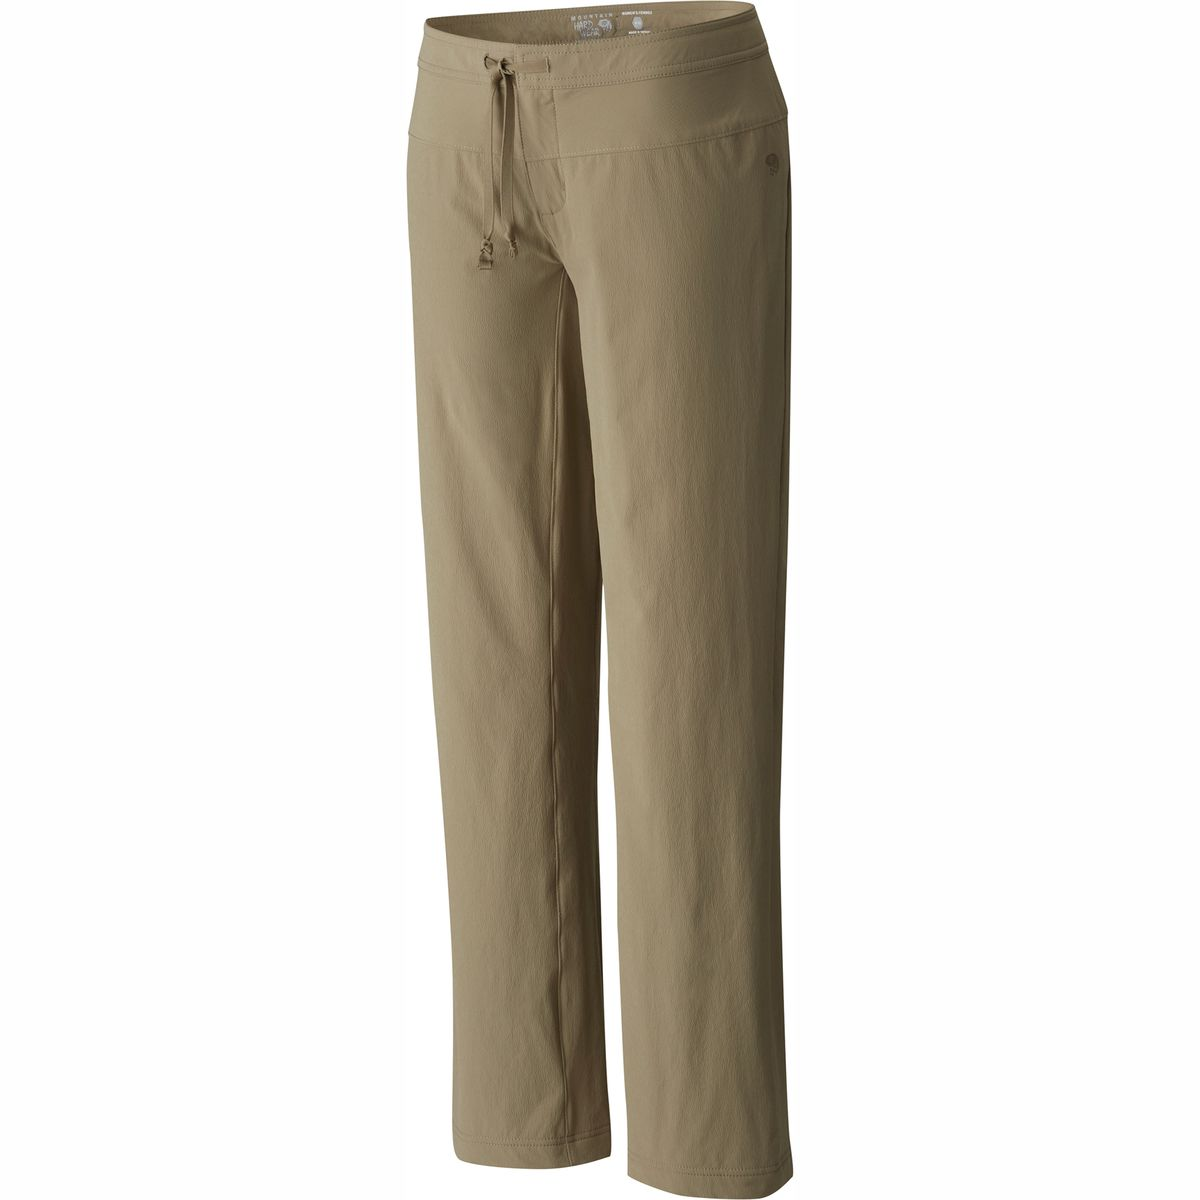 Yumalina Fleece-Lined Pant - Women